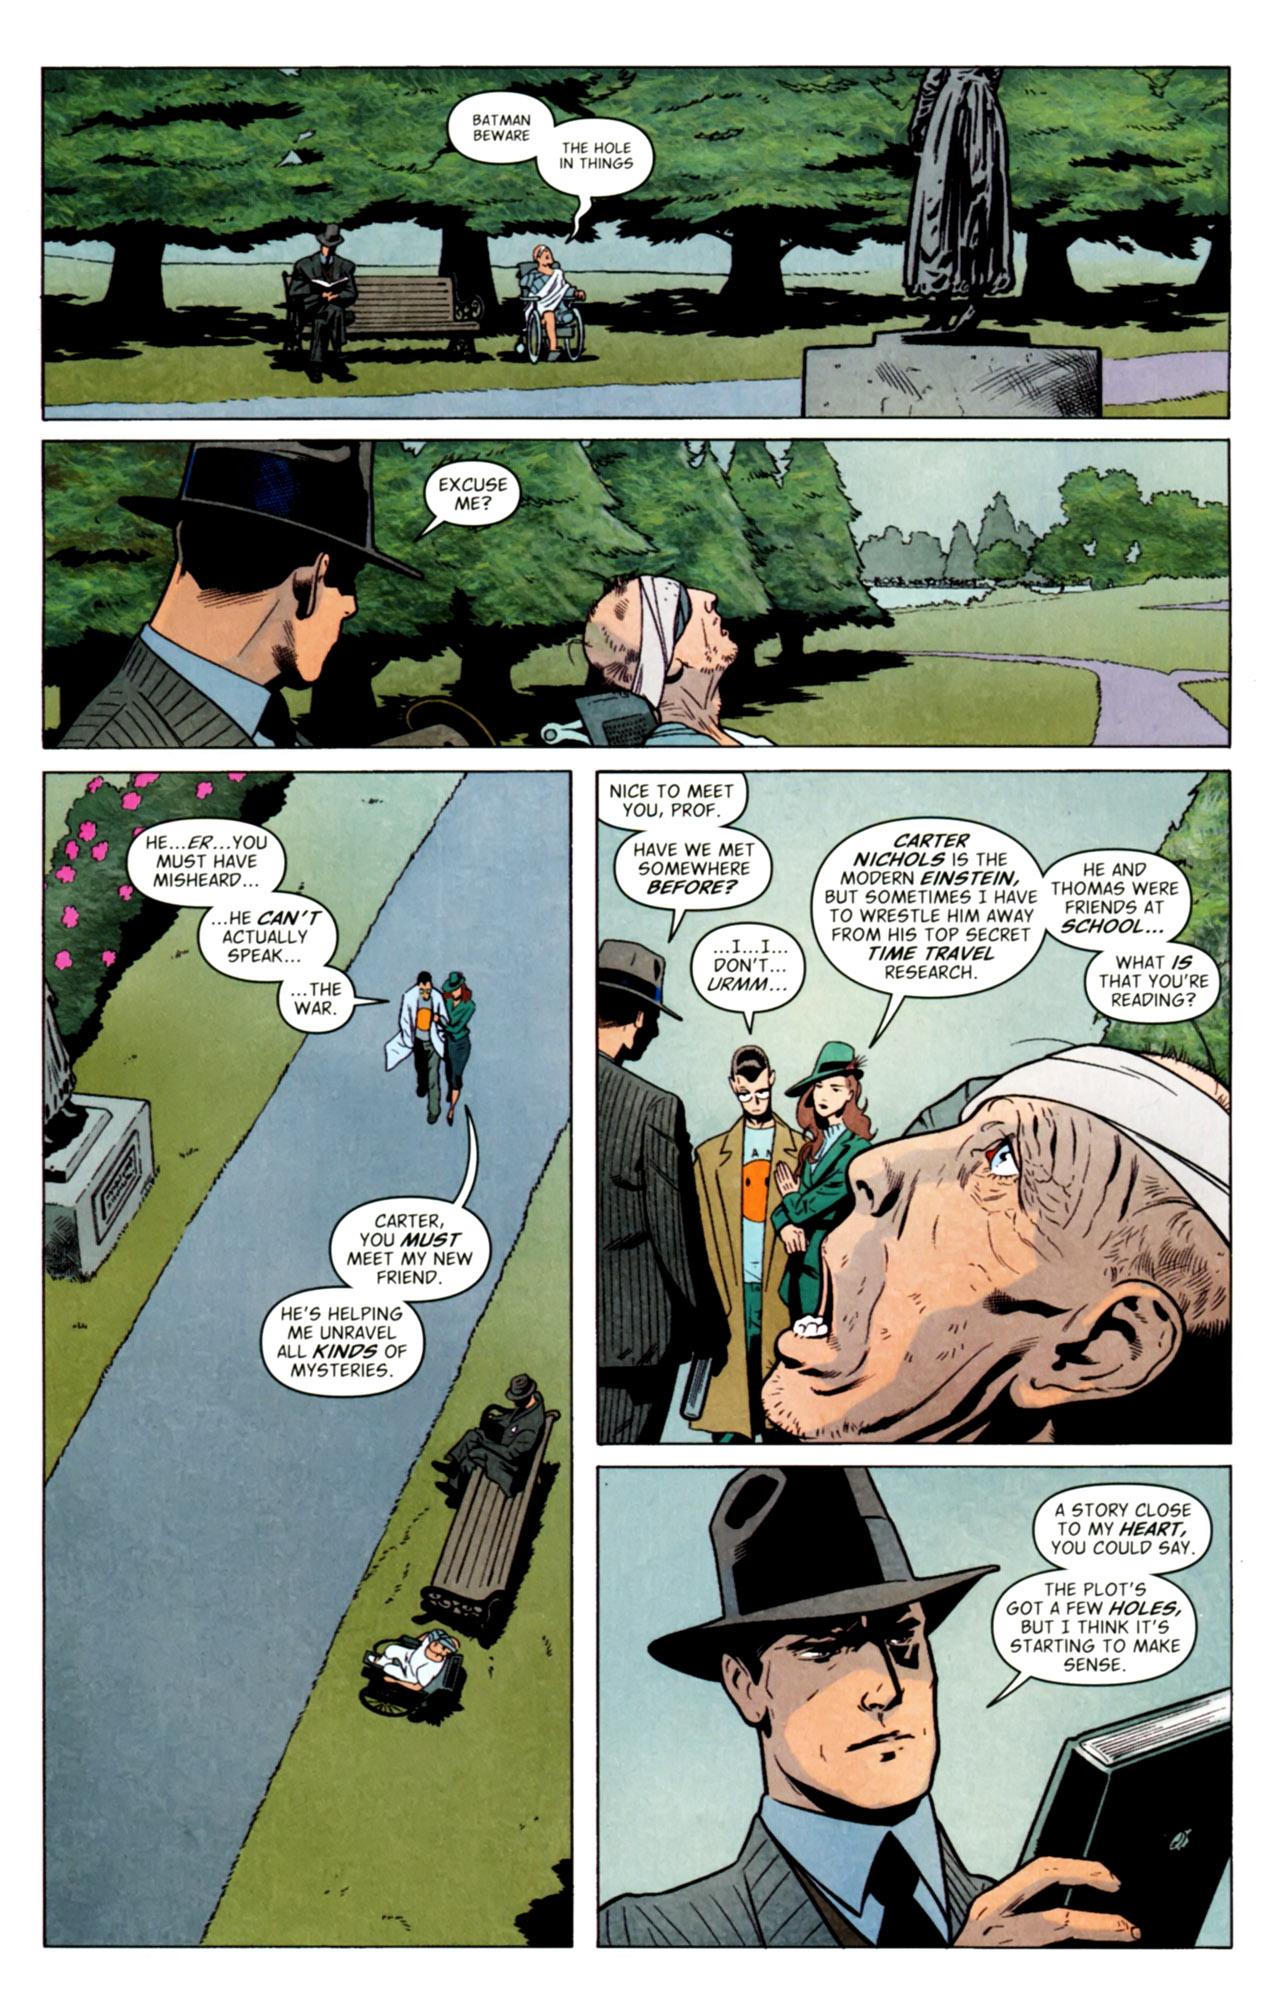 Batman The Return of Bruce Wayne Issue 5   Viewcomic reading